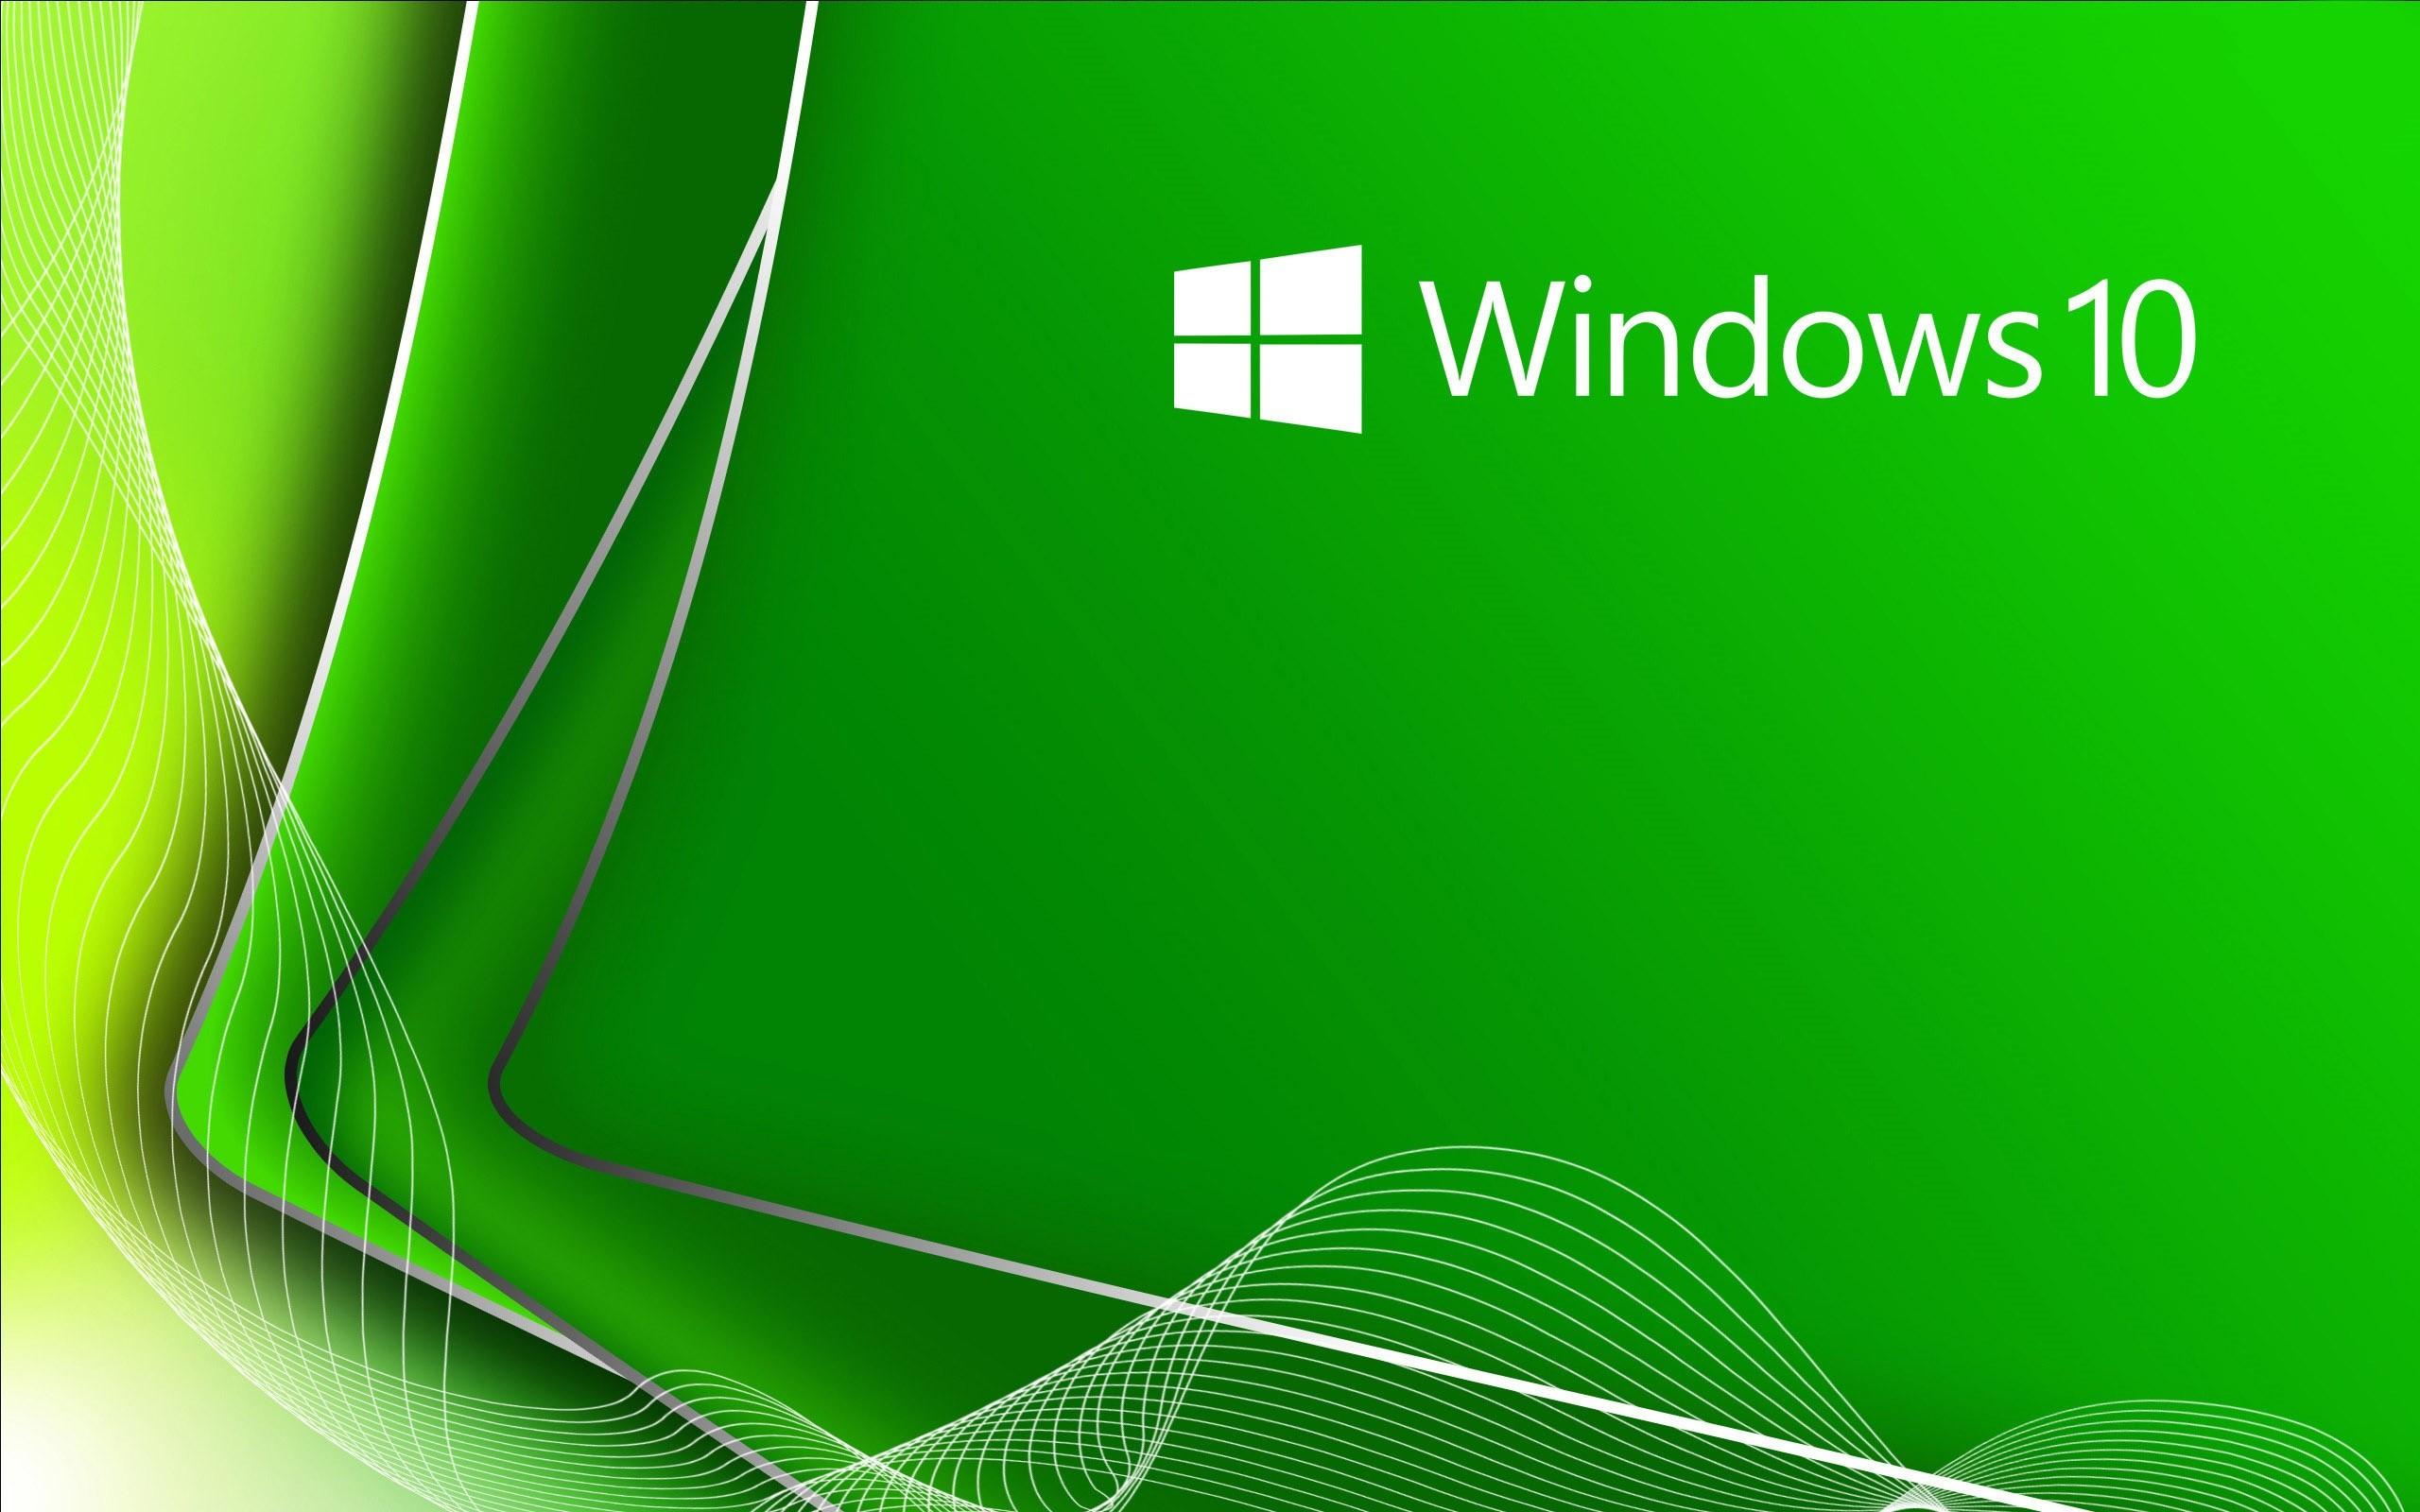 beautiful windows 10 logo hd wallpaper download | hd wallpapers android |  Pinterest | Windows 10, Wallpaper downloads and Hd wallpaper